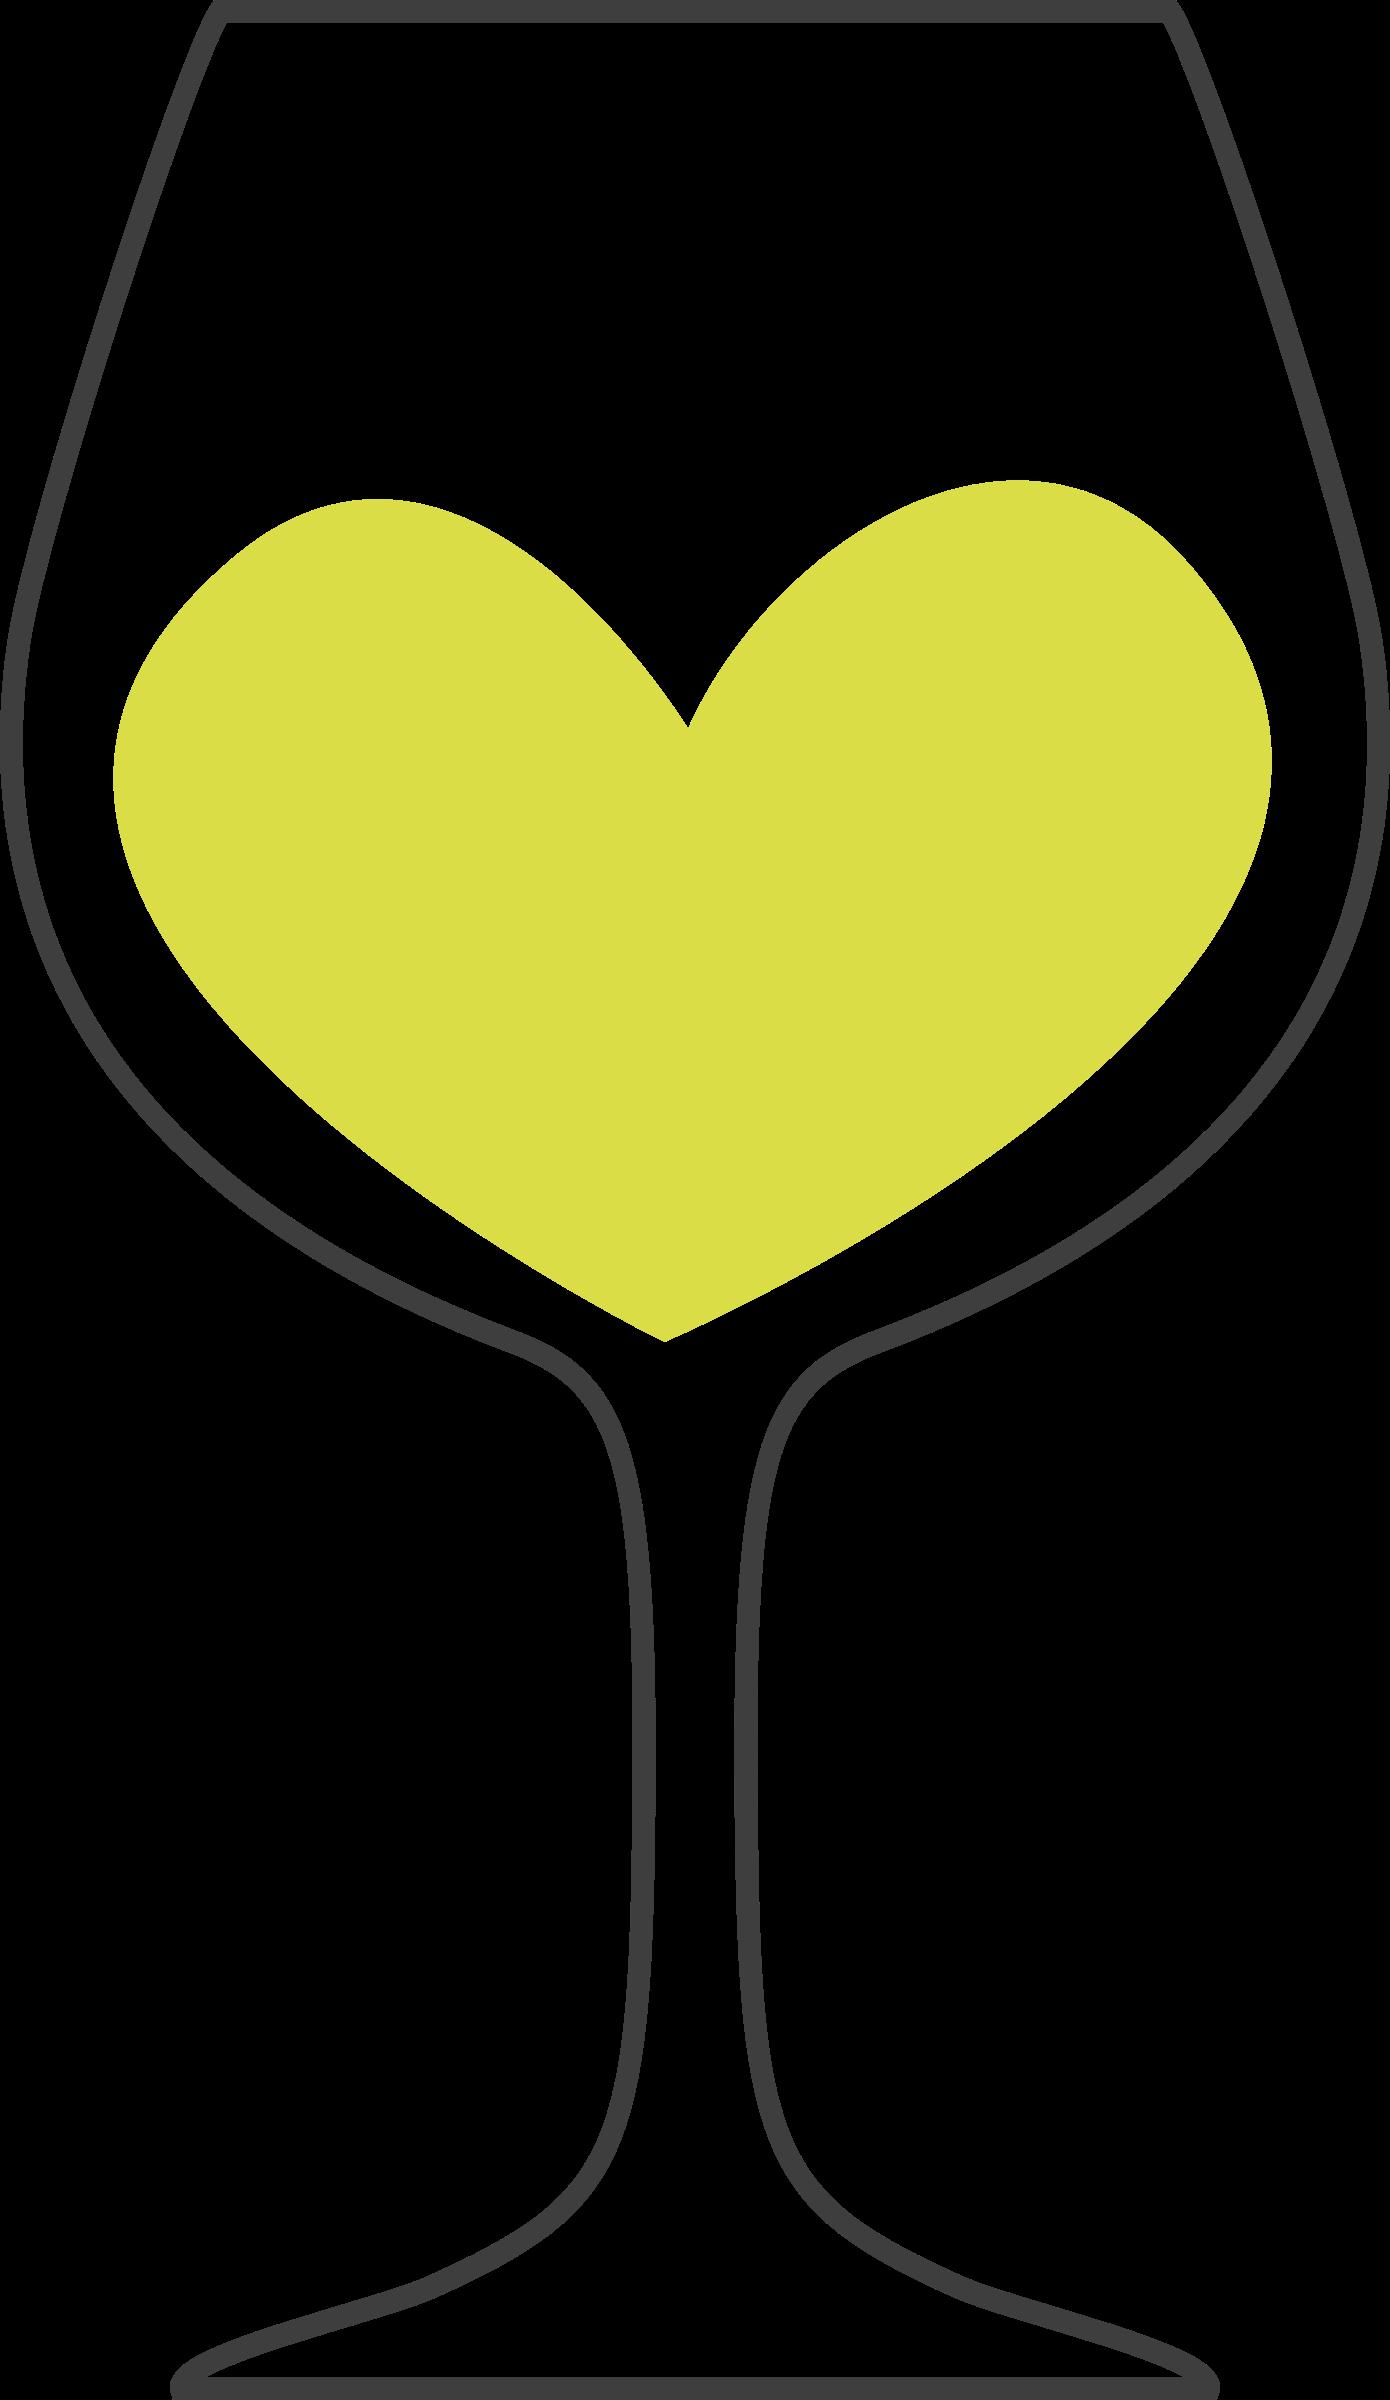 White clipart love. Of wine big image